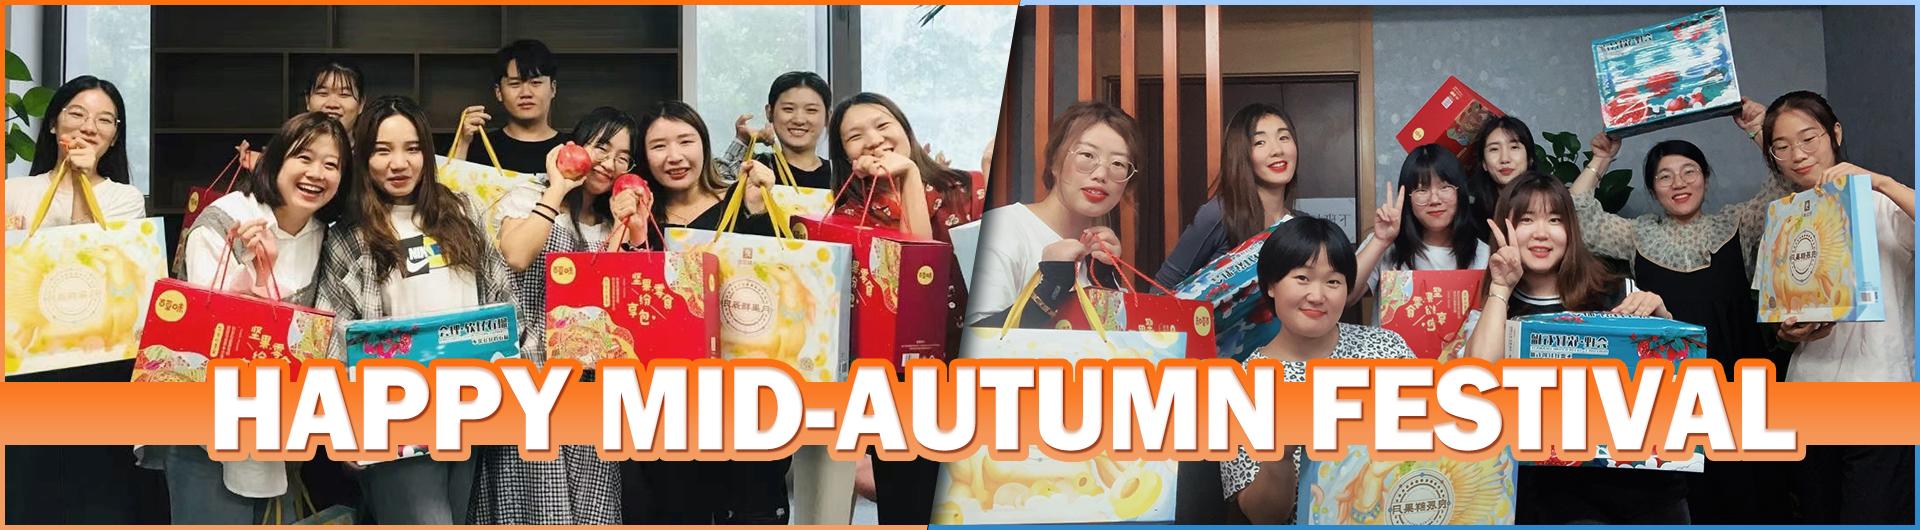 Happy Mid-Autumn Festival - FORSUN CNC